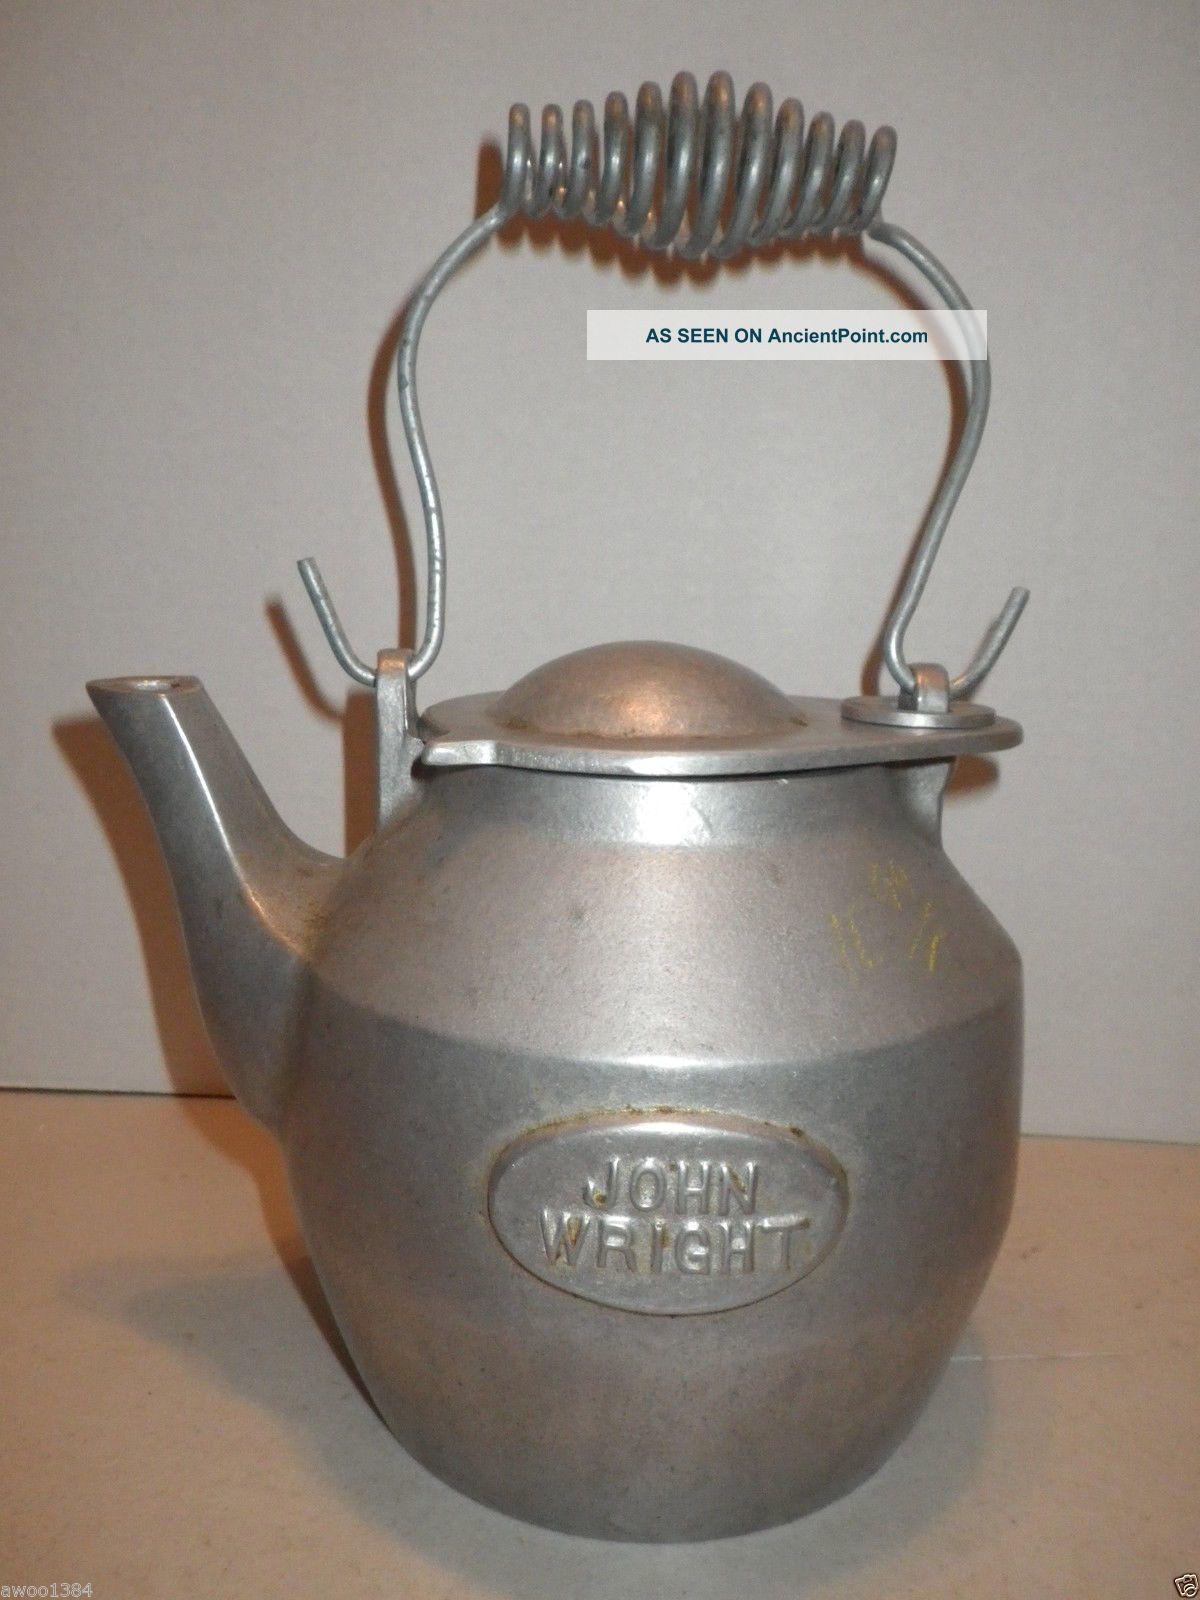 Cast Aluminum Kettle John Wright Teapot Large Stove Humidifier - Estate Find Hearth Ware photo